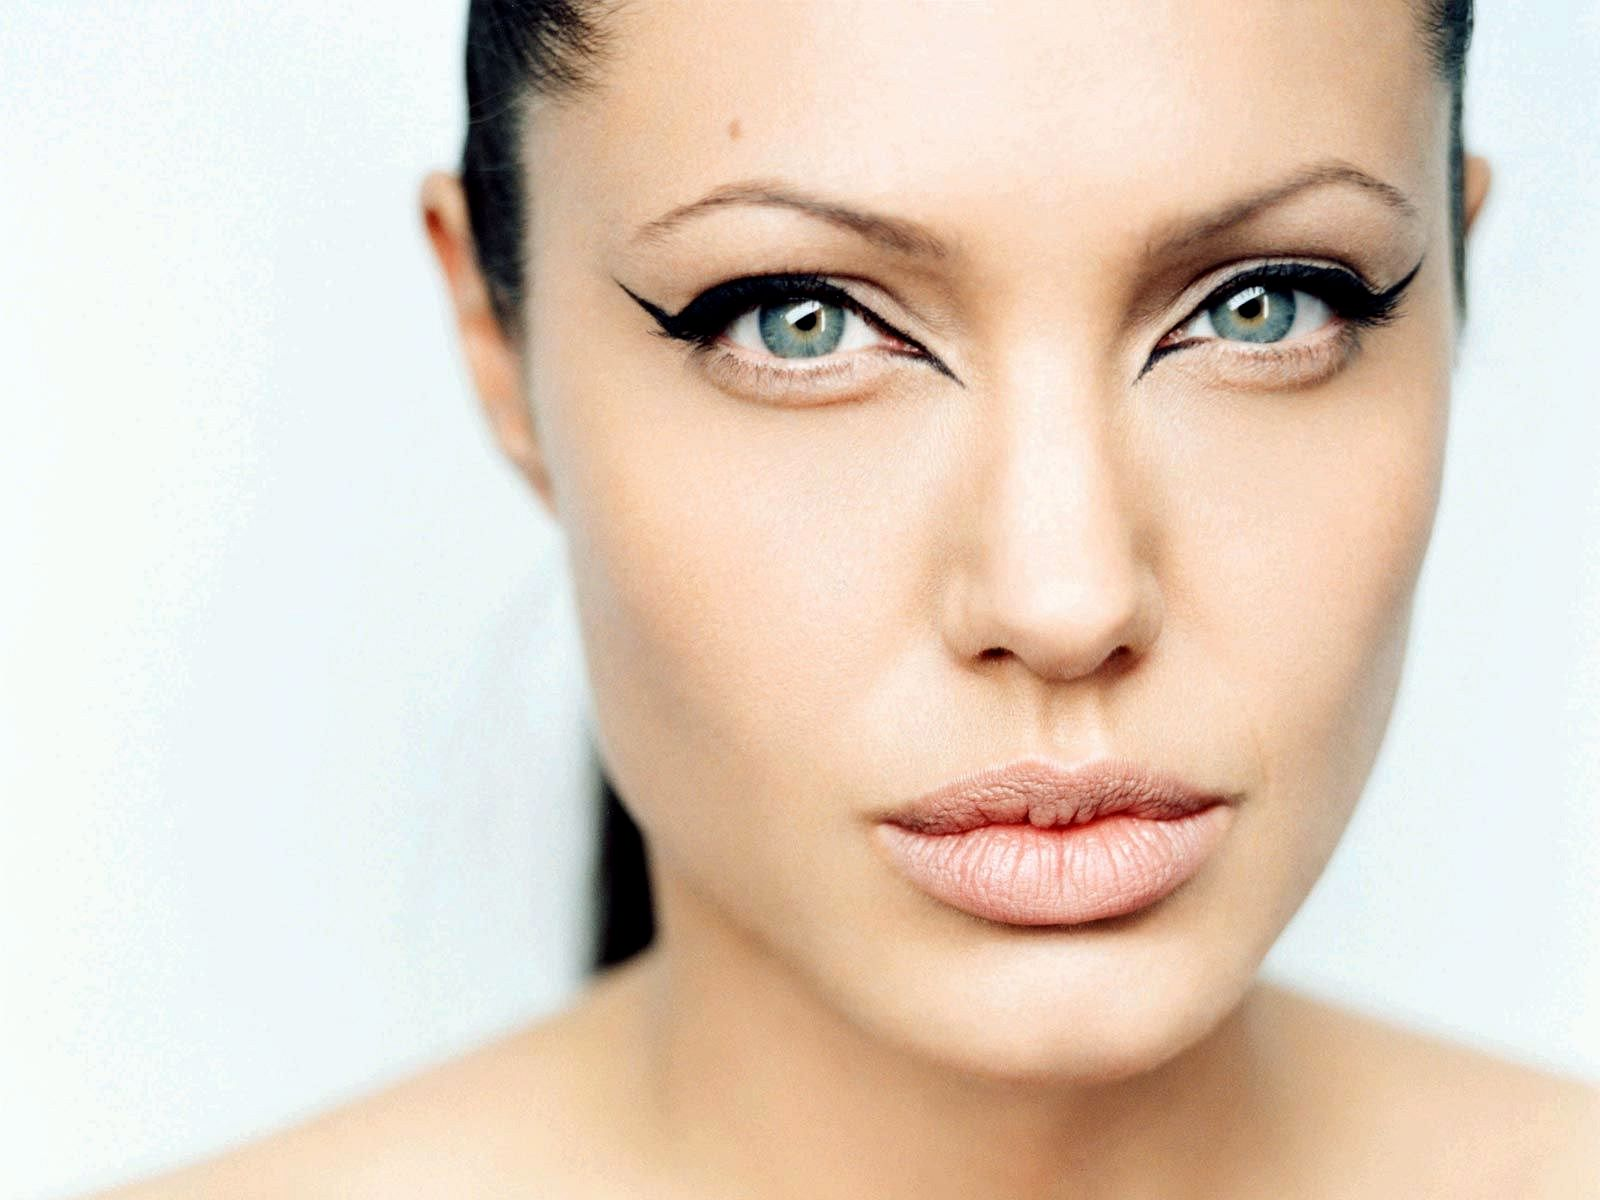 Awesome Angelina Jolie 2013 Wallpaper Full HD ImageBankbiz 1600x1200